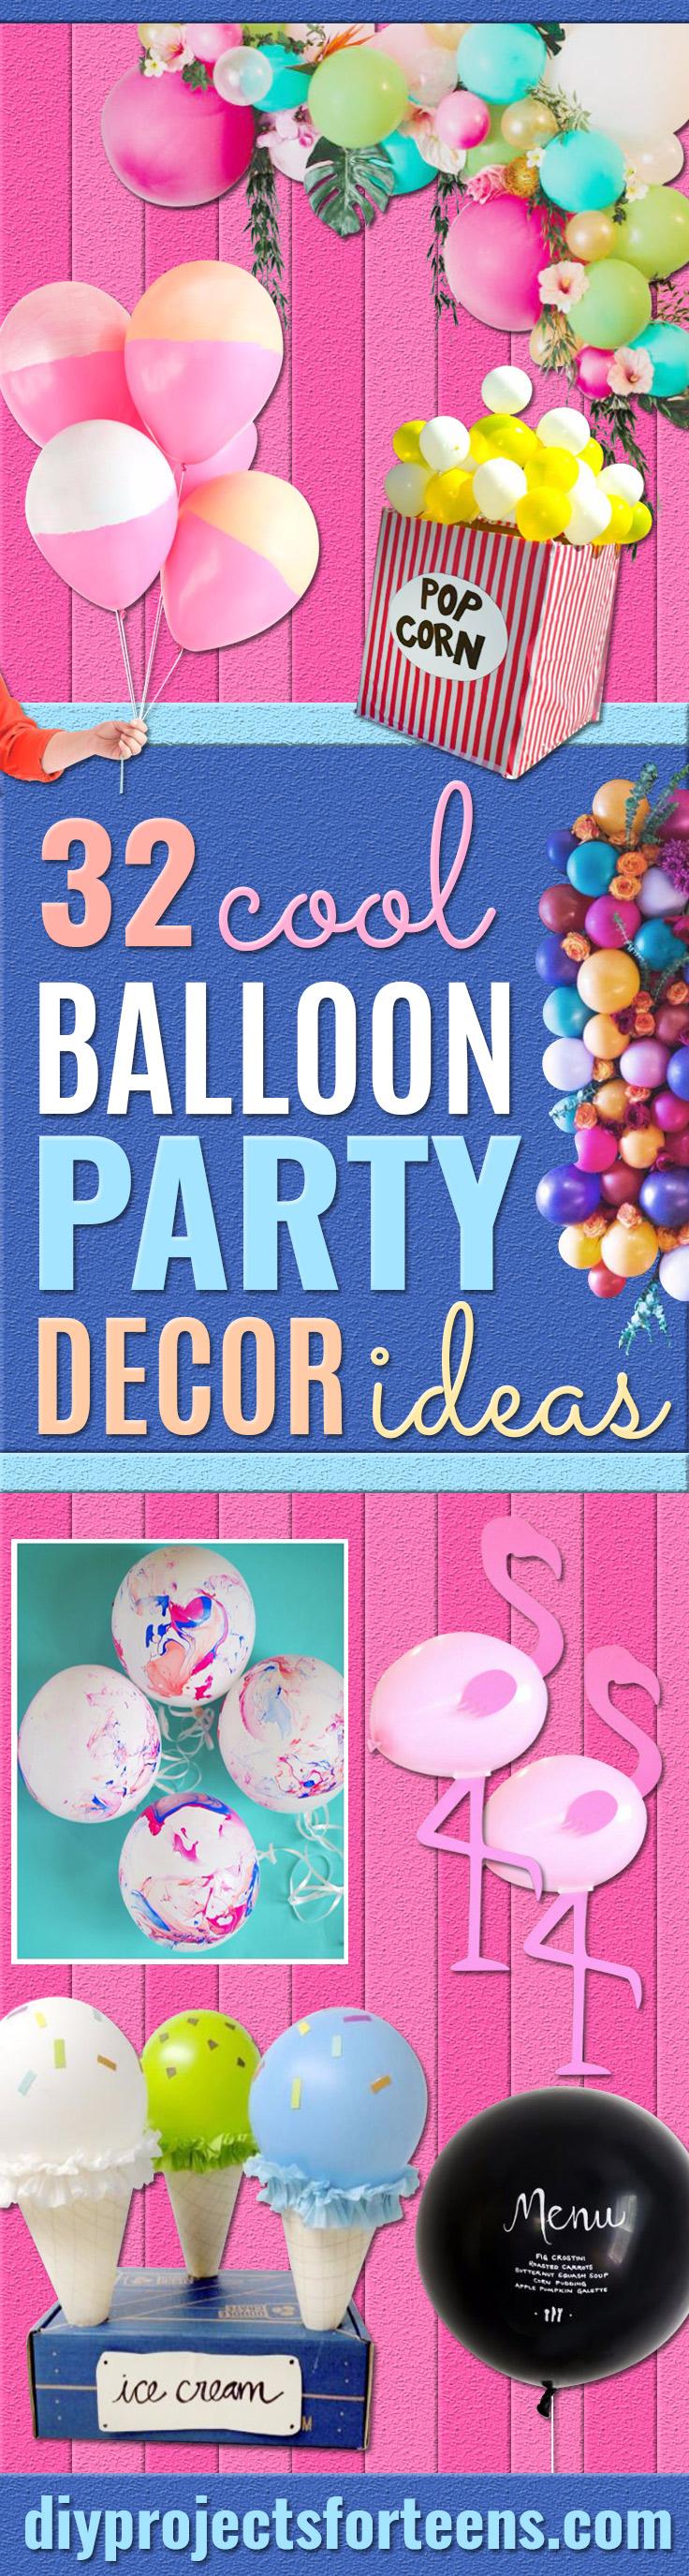 Balloon Crafts - Fun Balloon Craft Ideas, Wall Art Projects and Cute Ballon Decor - DIY Balloon Ideas for Toddlers, Preschool Kids, Teens and Adults - Cheap Crafts Made With Balloons - Pumpkins, Bowls, Marshmallow Shooters, Balls, Glow Stick, Hot Air, Stress Ball http://diyjoy.com/balloon-crafts